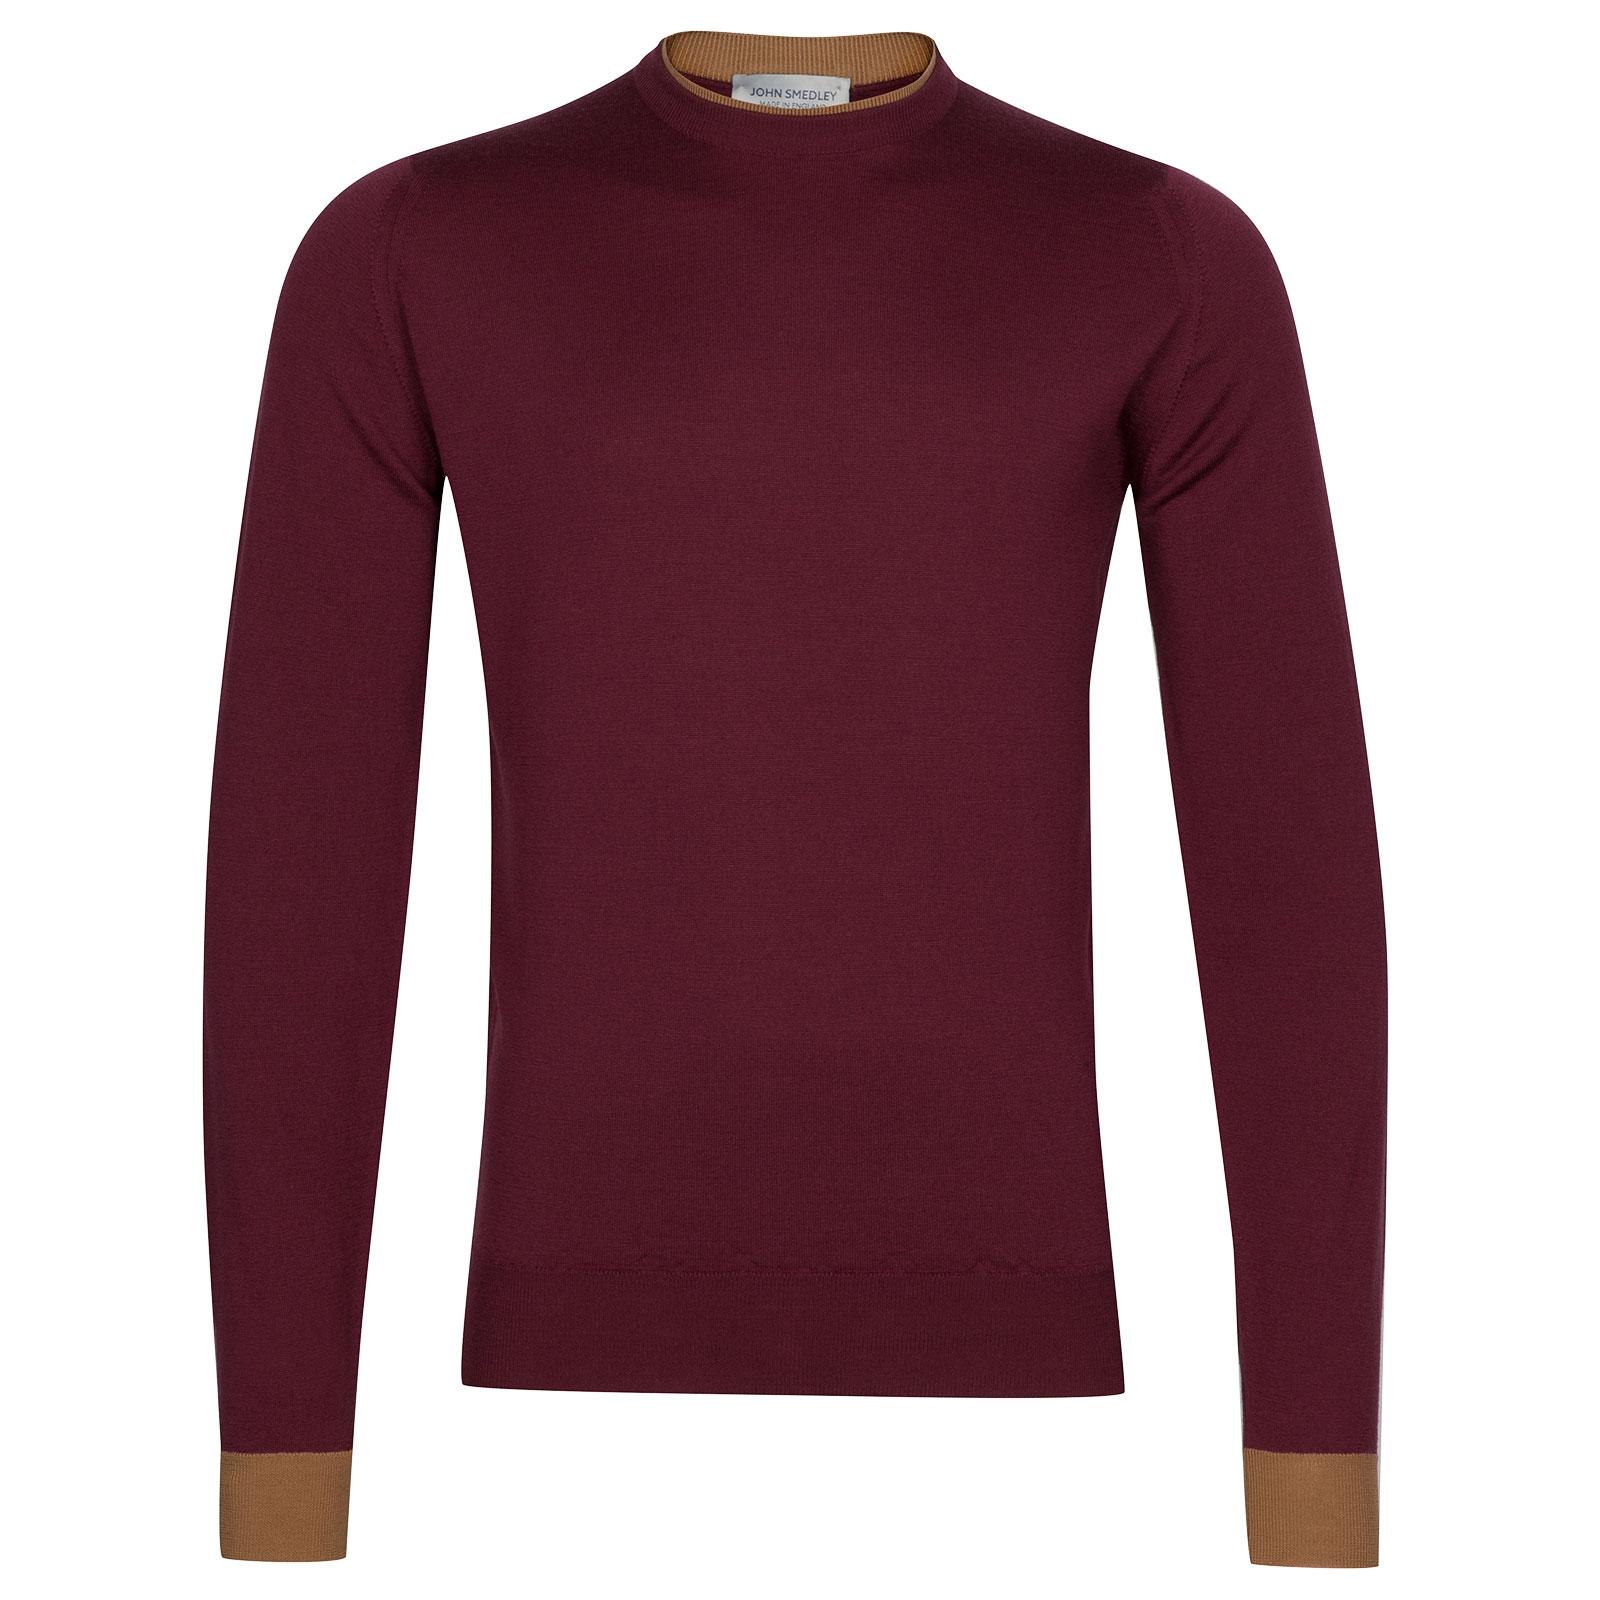 John Smedley Kenn Extra Fine Merino Pullover in Bordeaux-L